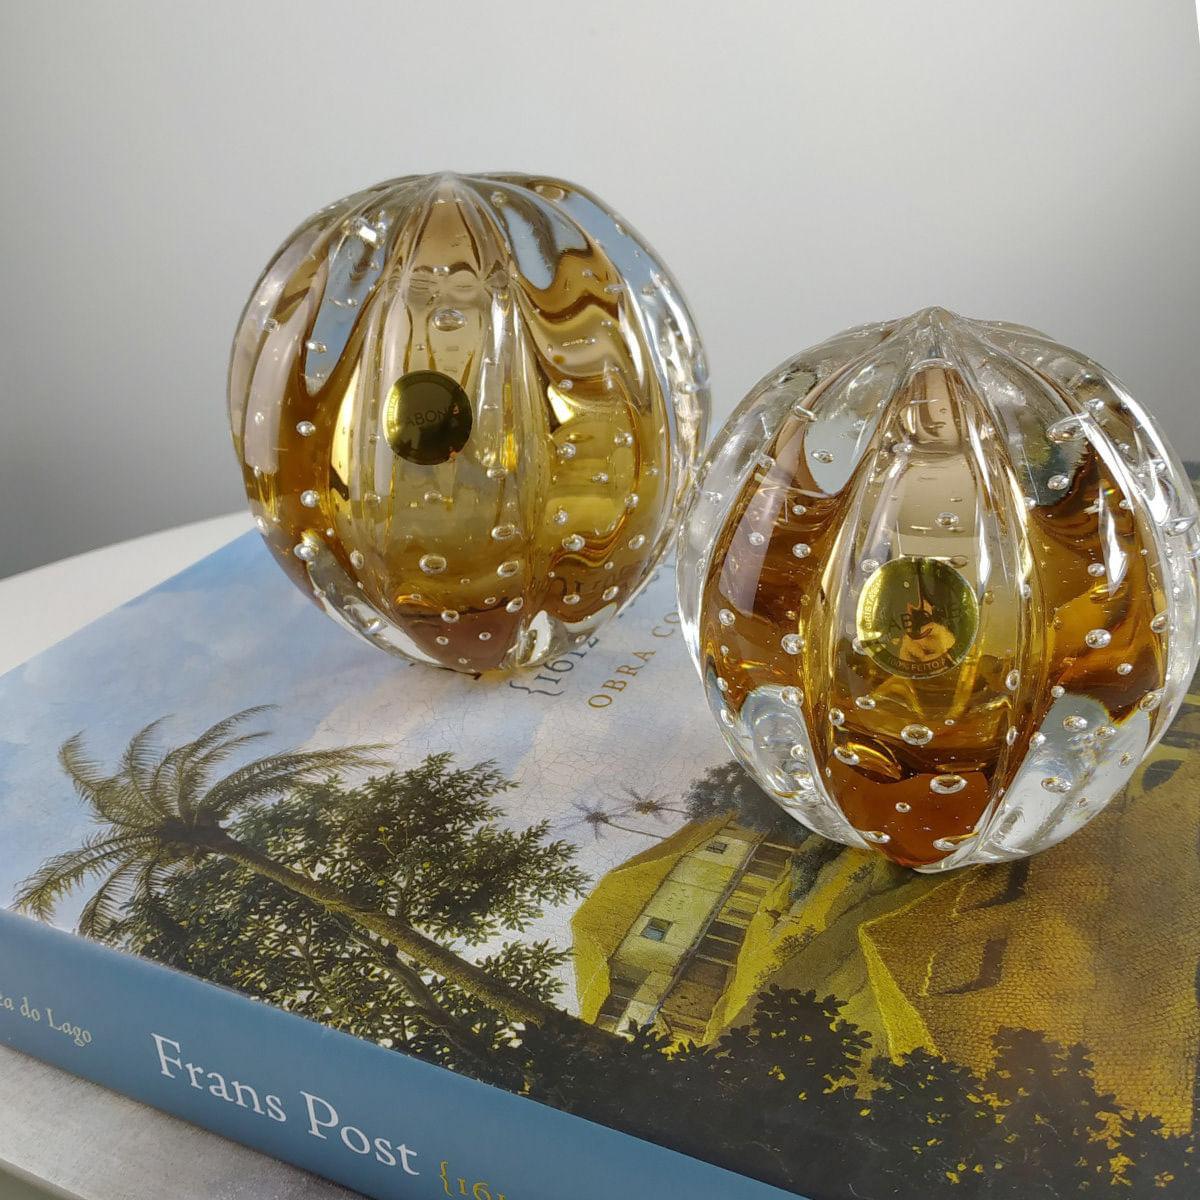 Peso de Cristal Murano D'labone - Cristal Garnet Senna 10cm